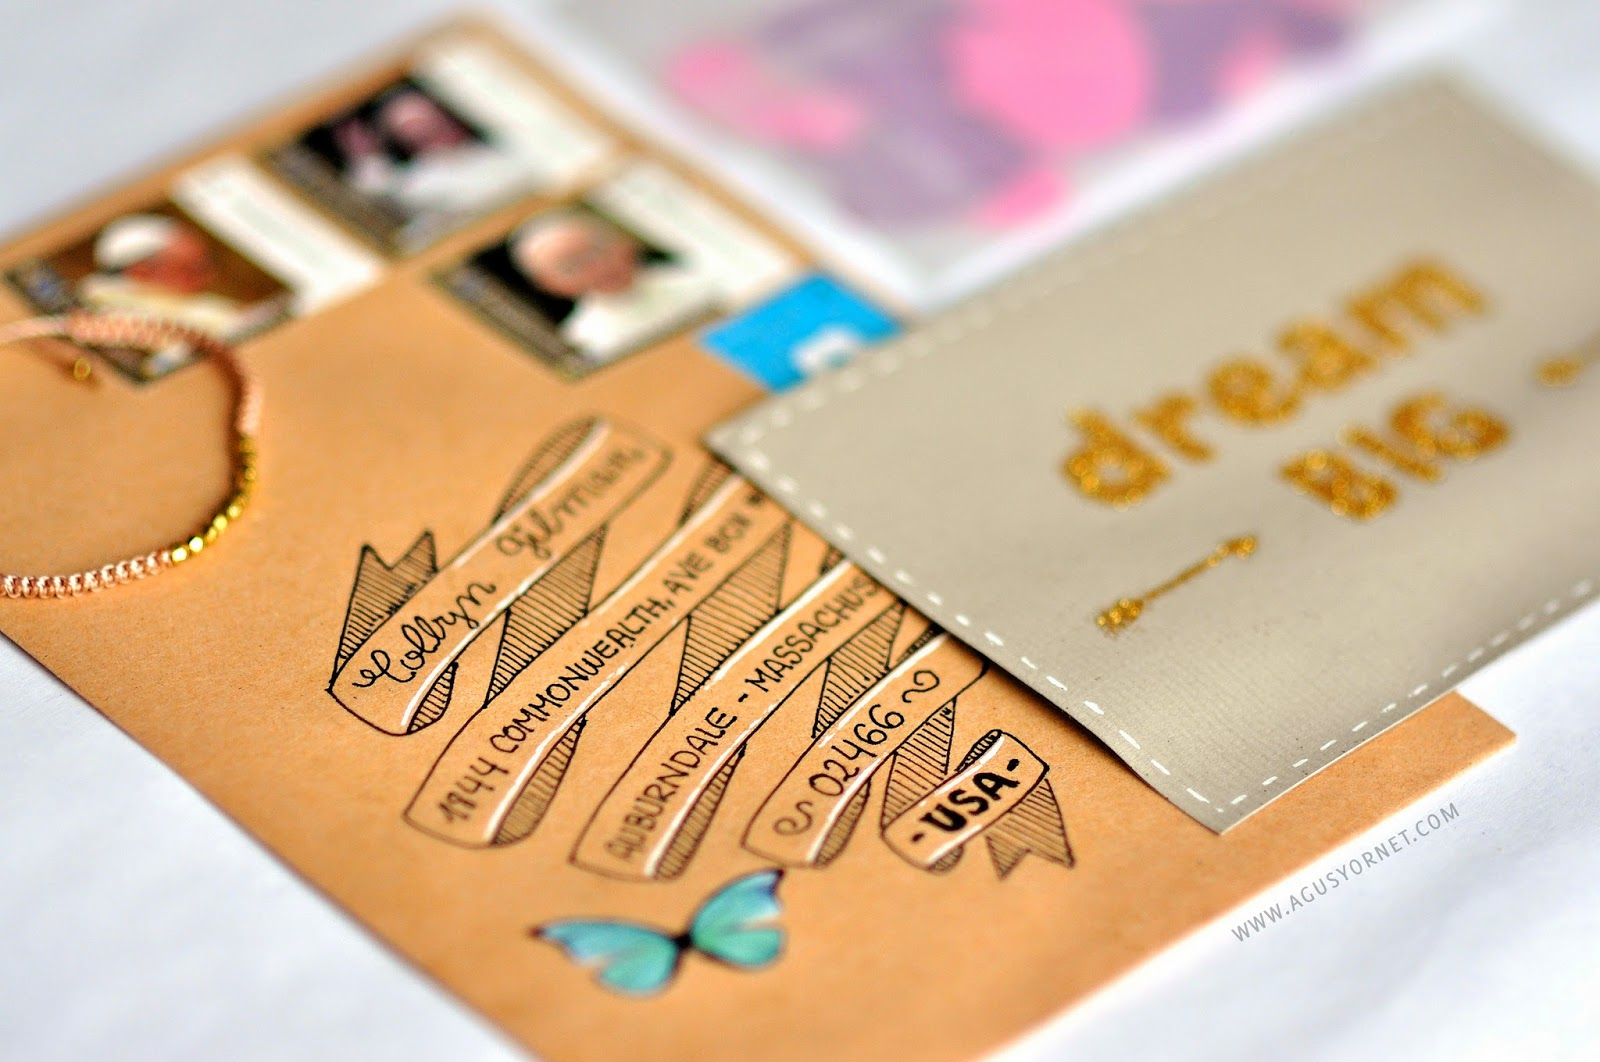 Snail Mail Agus Yornet